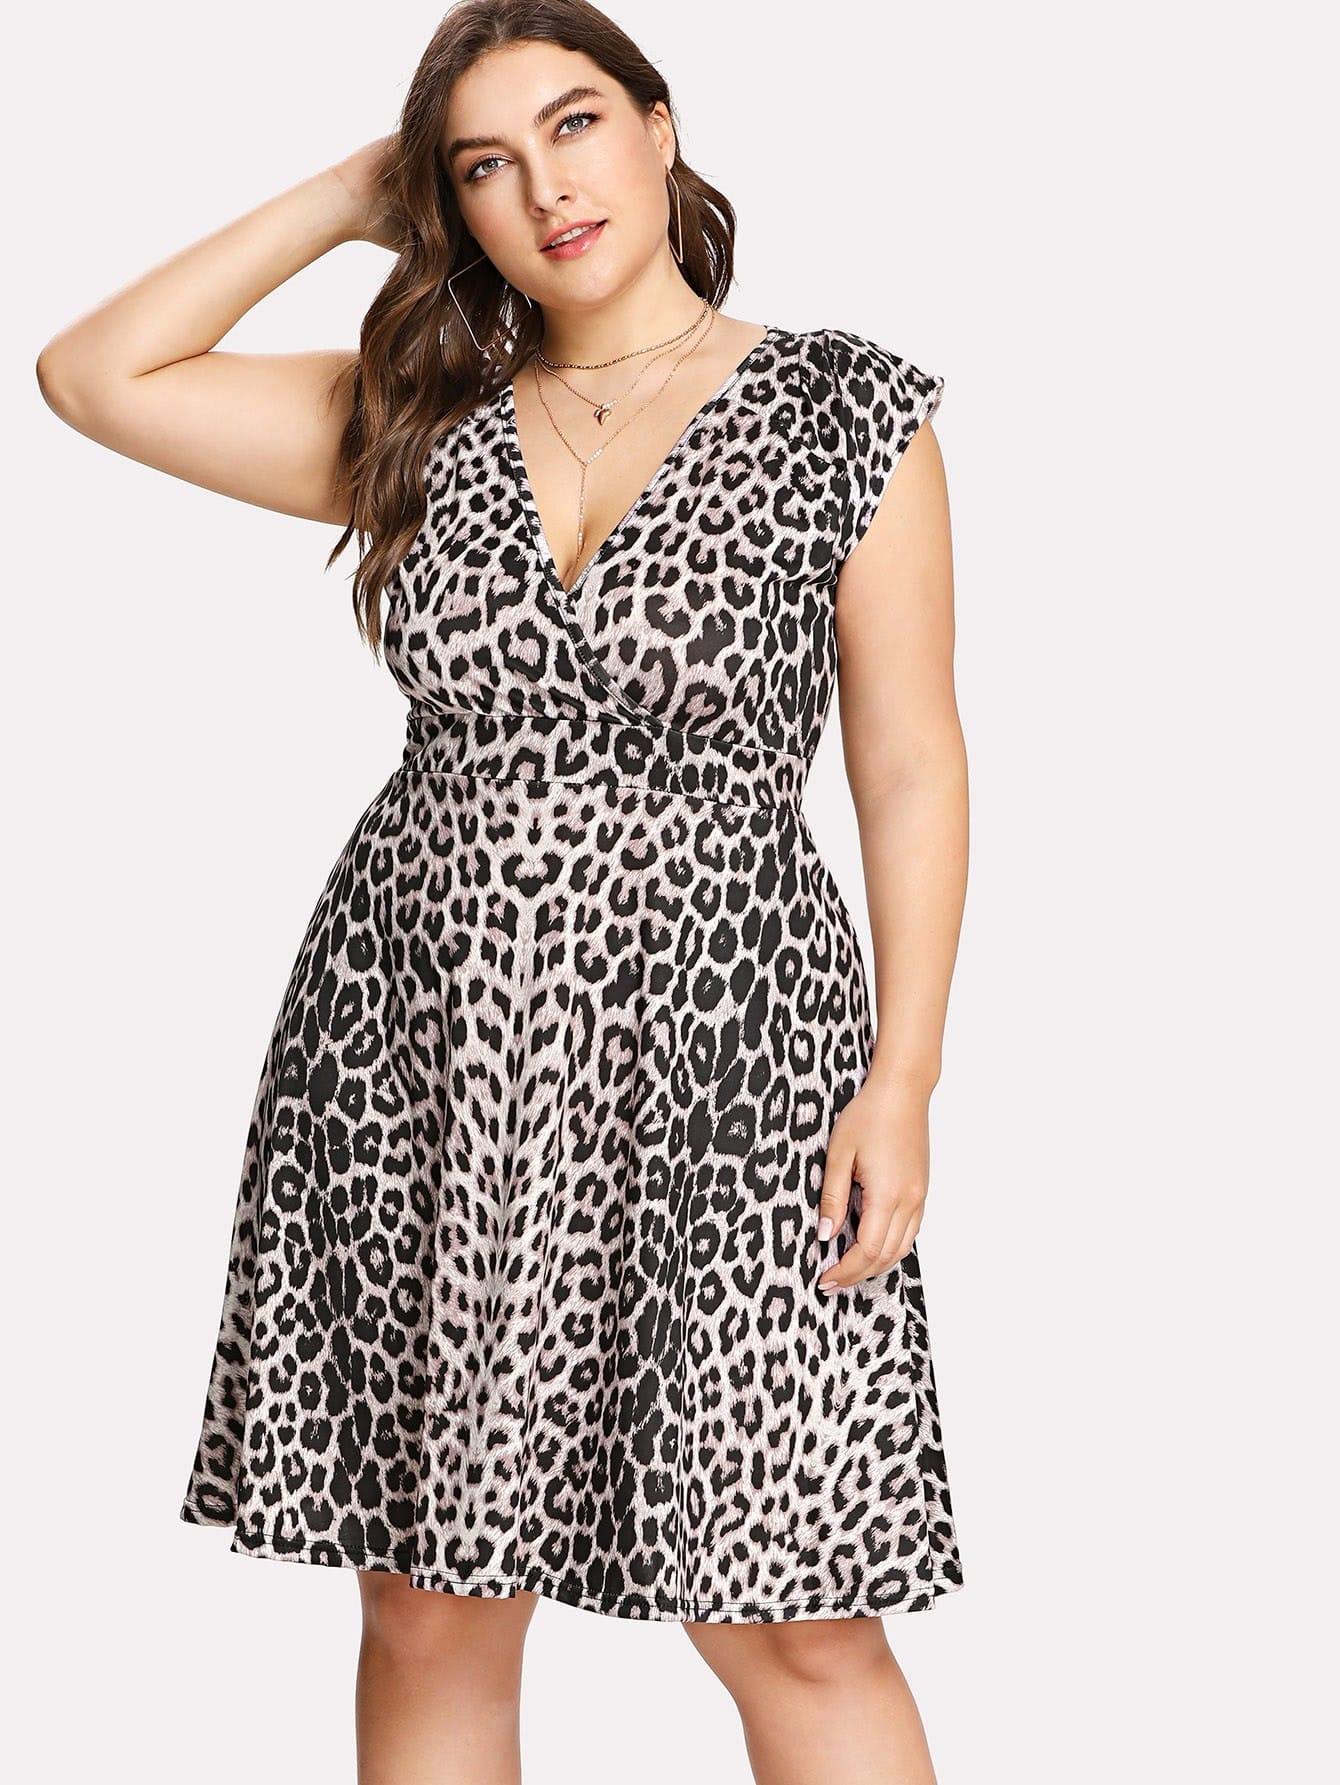 Surplice Neckline Leopard Dress